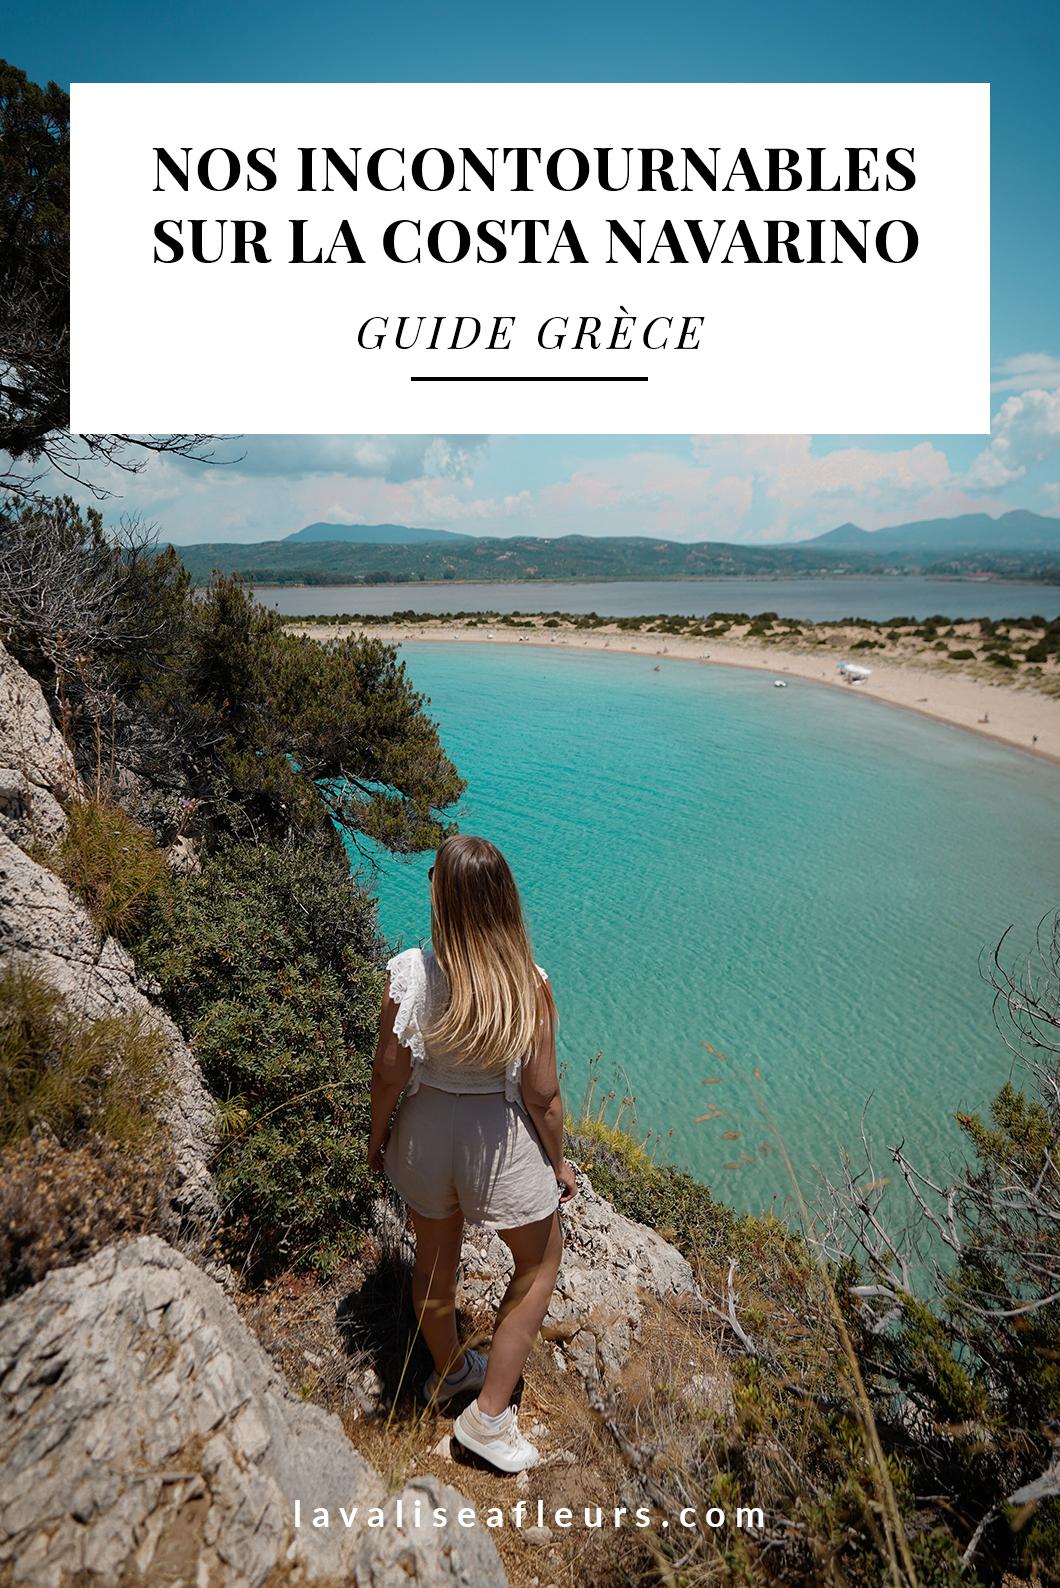 Nos incontournables sur la Costa Navarino, guide de Grèce